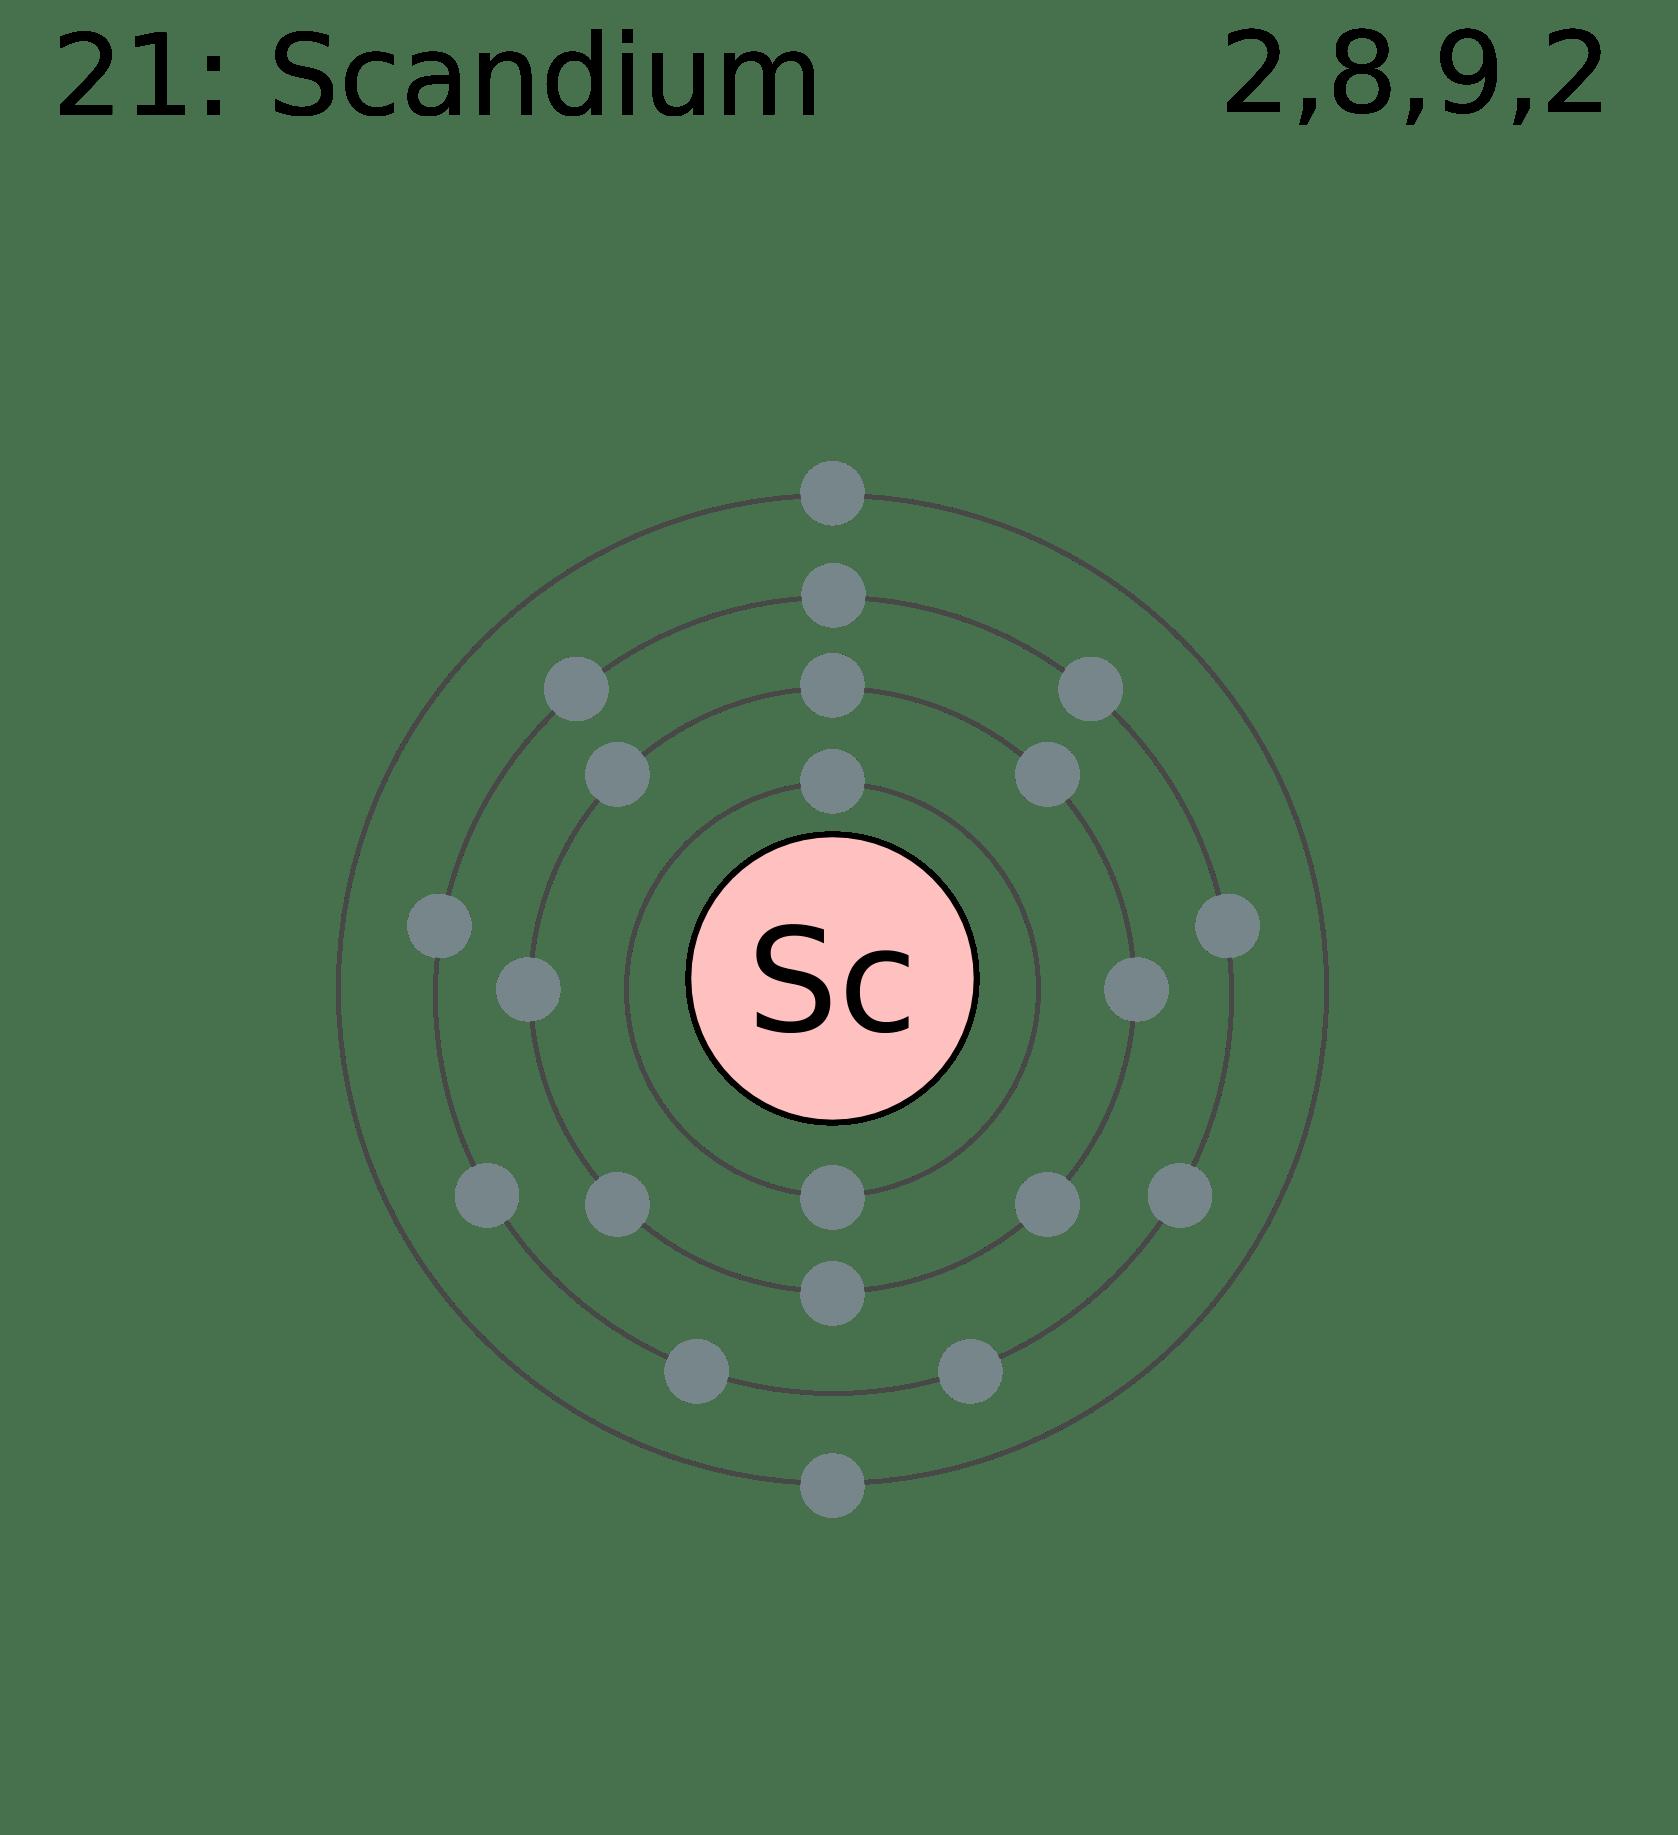 File Electron Shell 021 Scandium